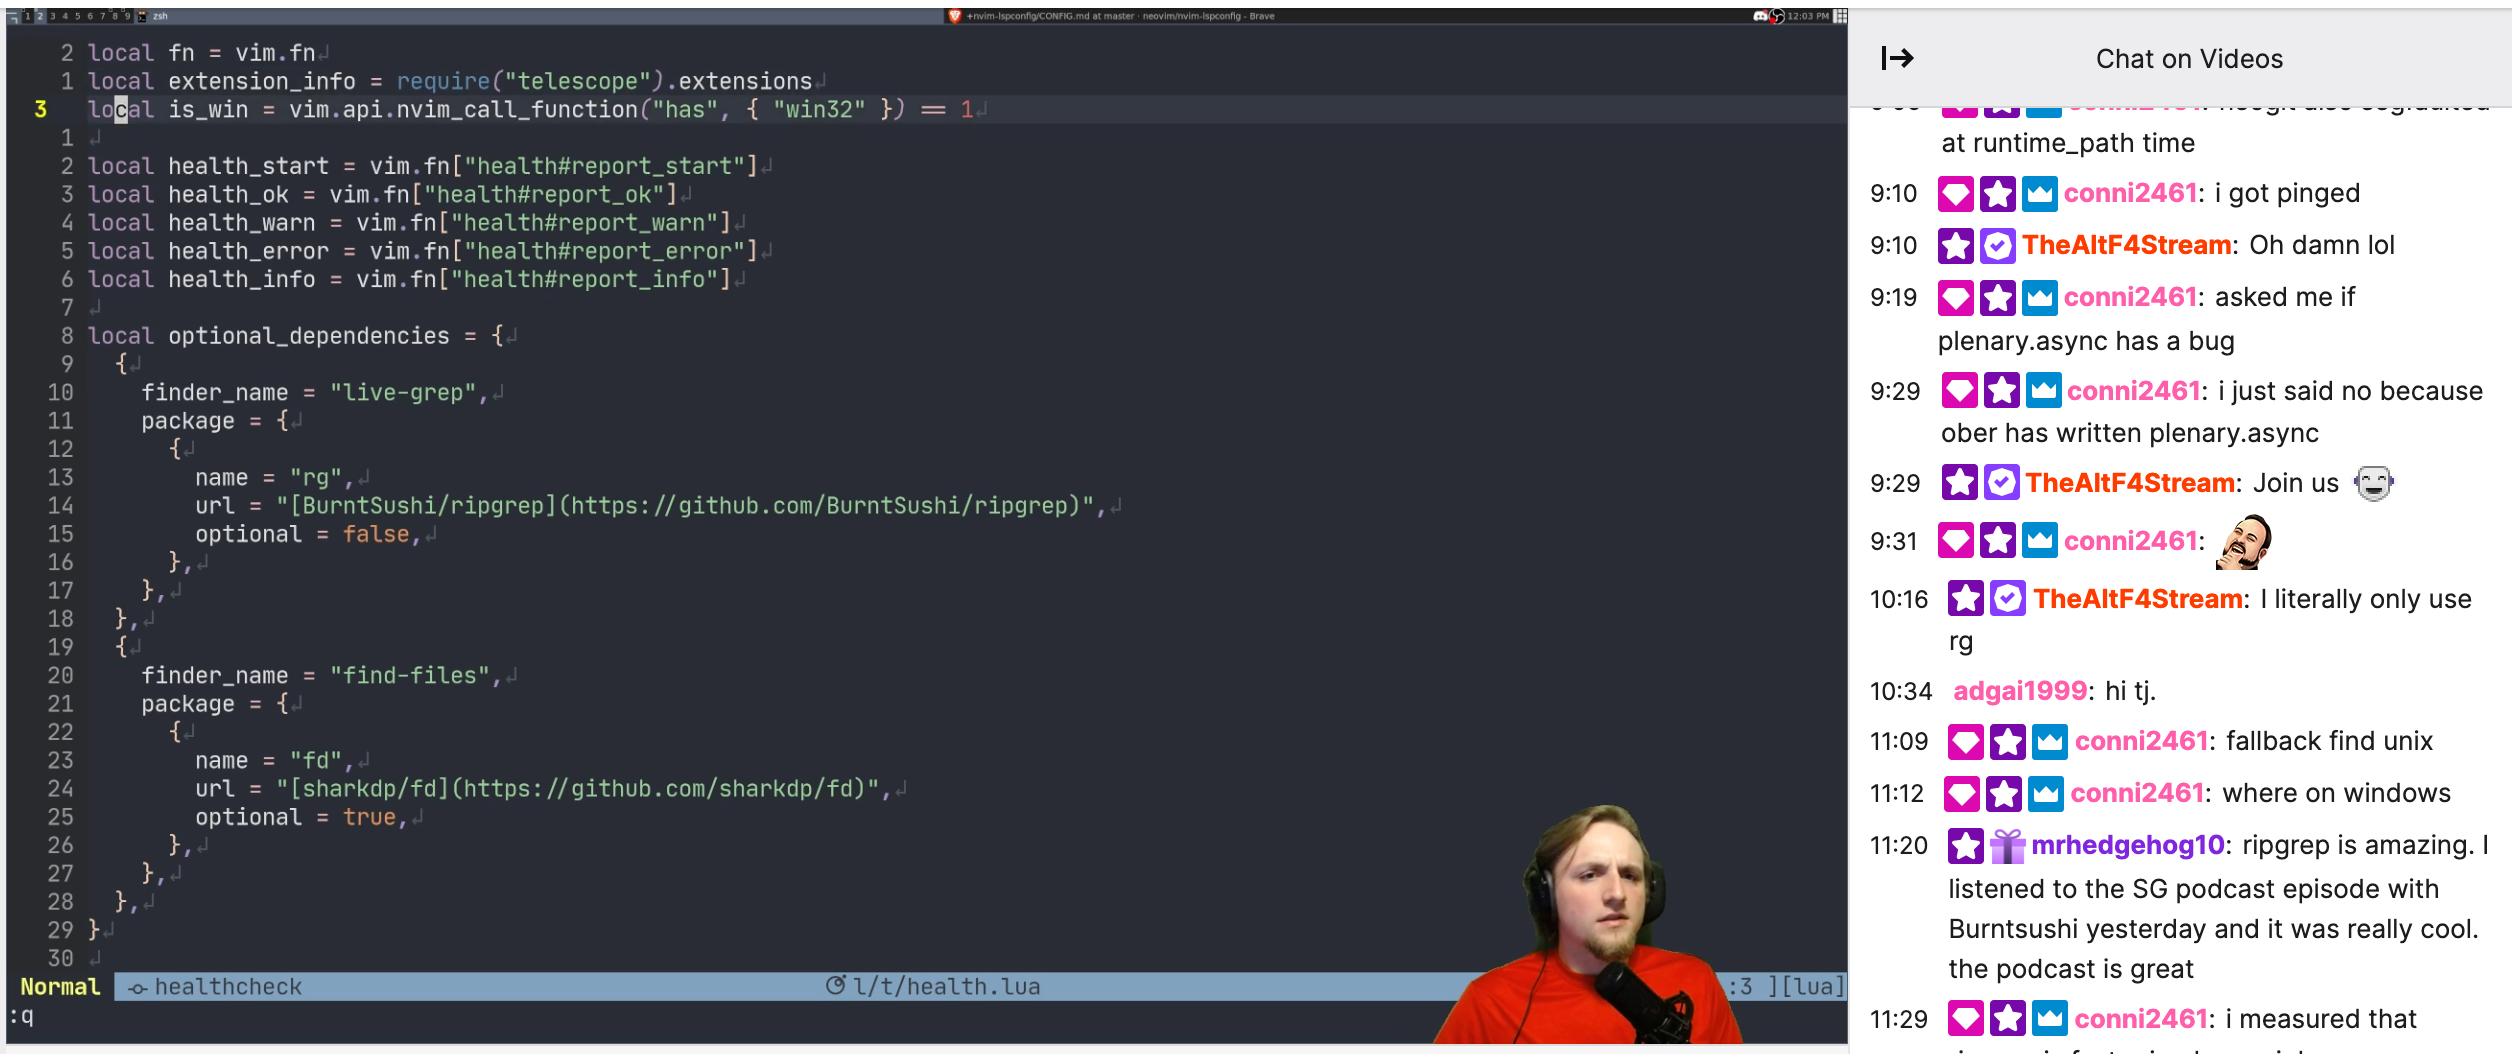 TJ coding live on Twitch